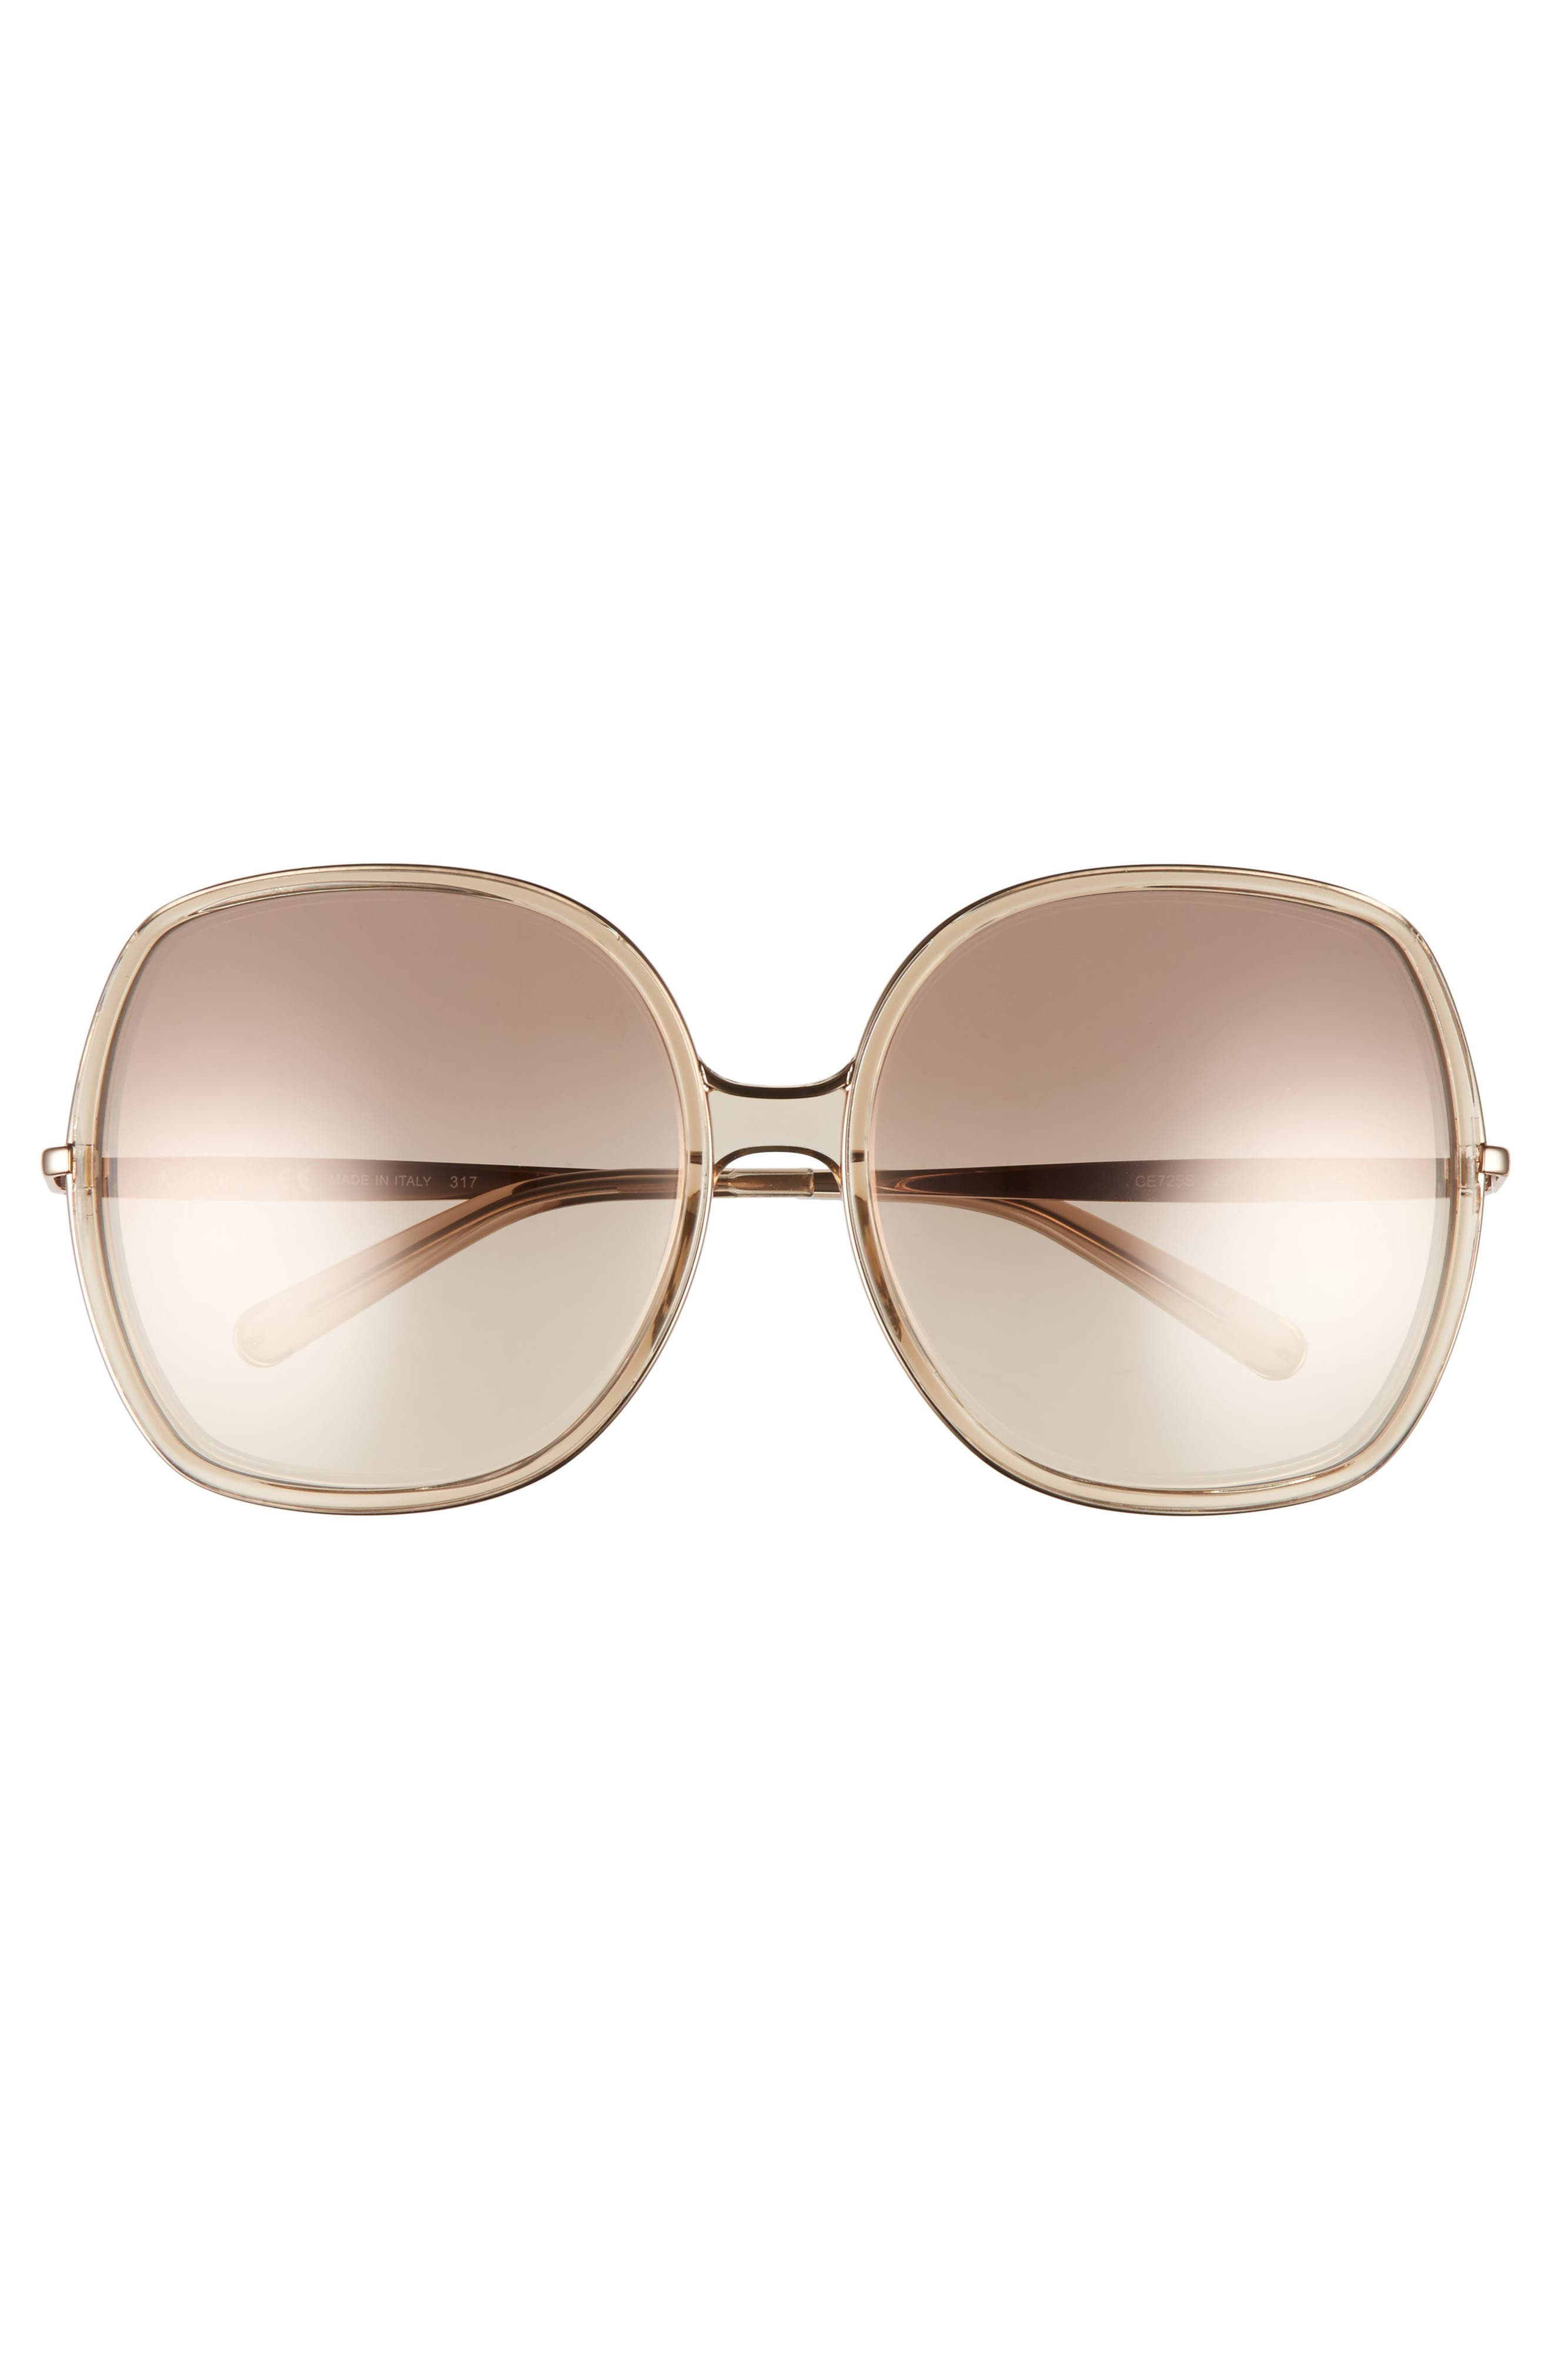 62mm Oversized Gradient Lens Square Sunglasses,                             Alternate thumbnail 3, color,                             Nude